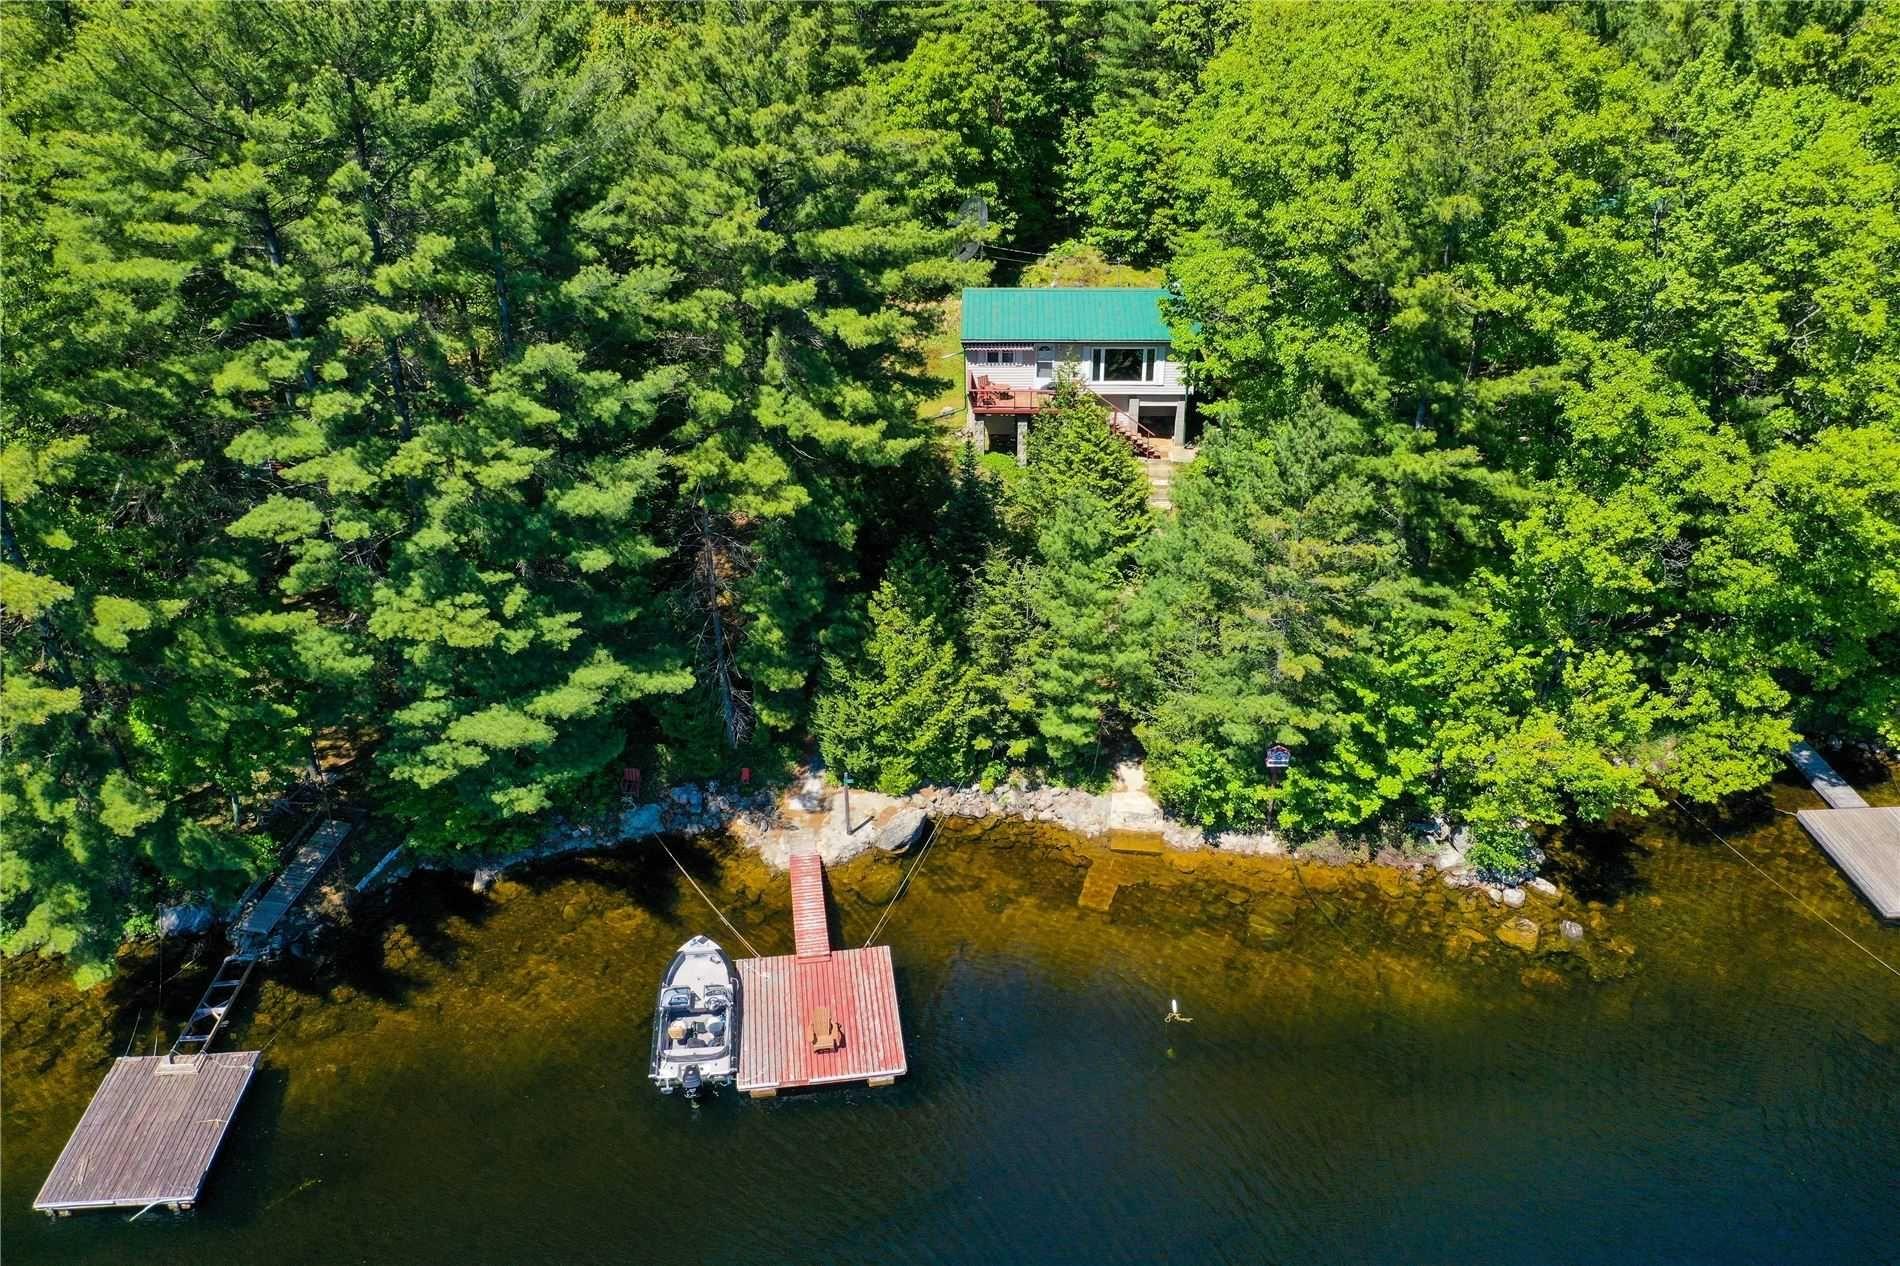 Main Photo: 1282 Woa Anstruther Lake View in North Kawartha: Rural North Kawartha House (Bungalow) for sale : MLS®# X5255516